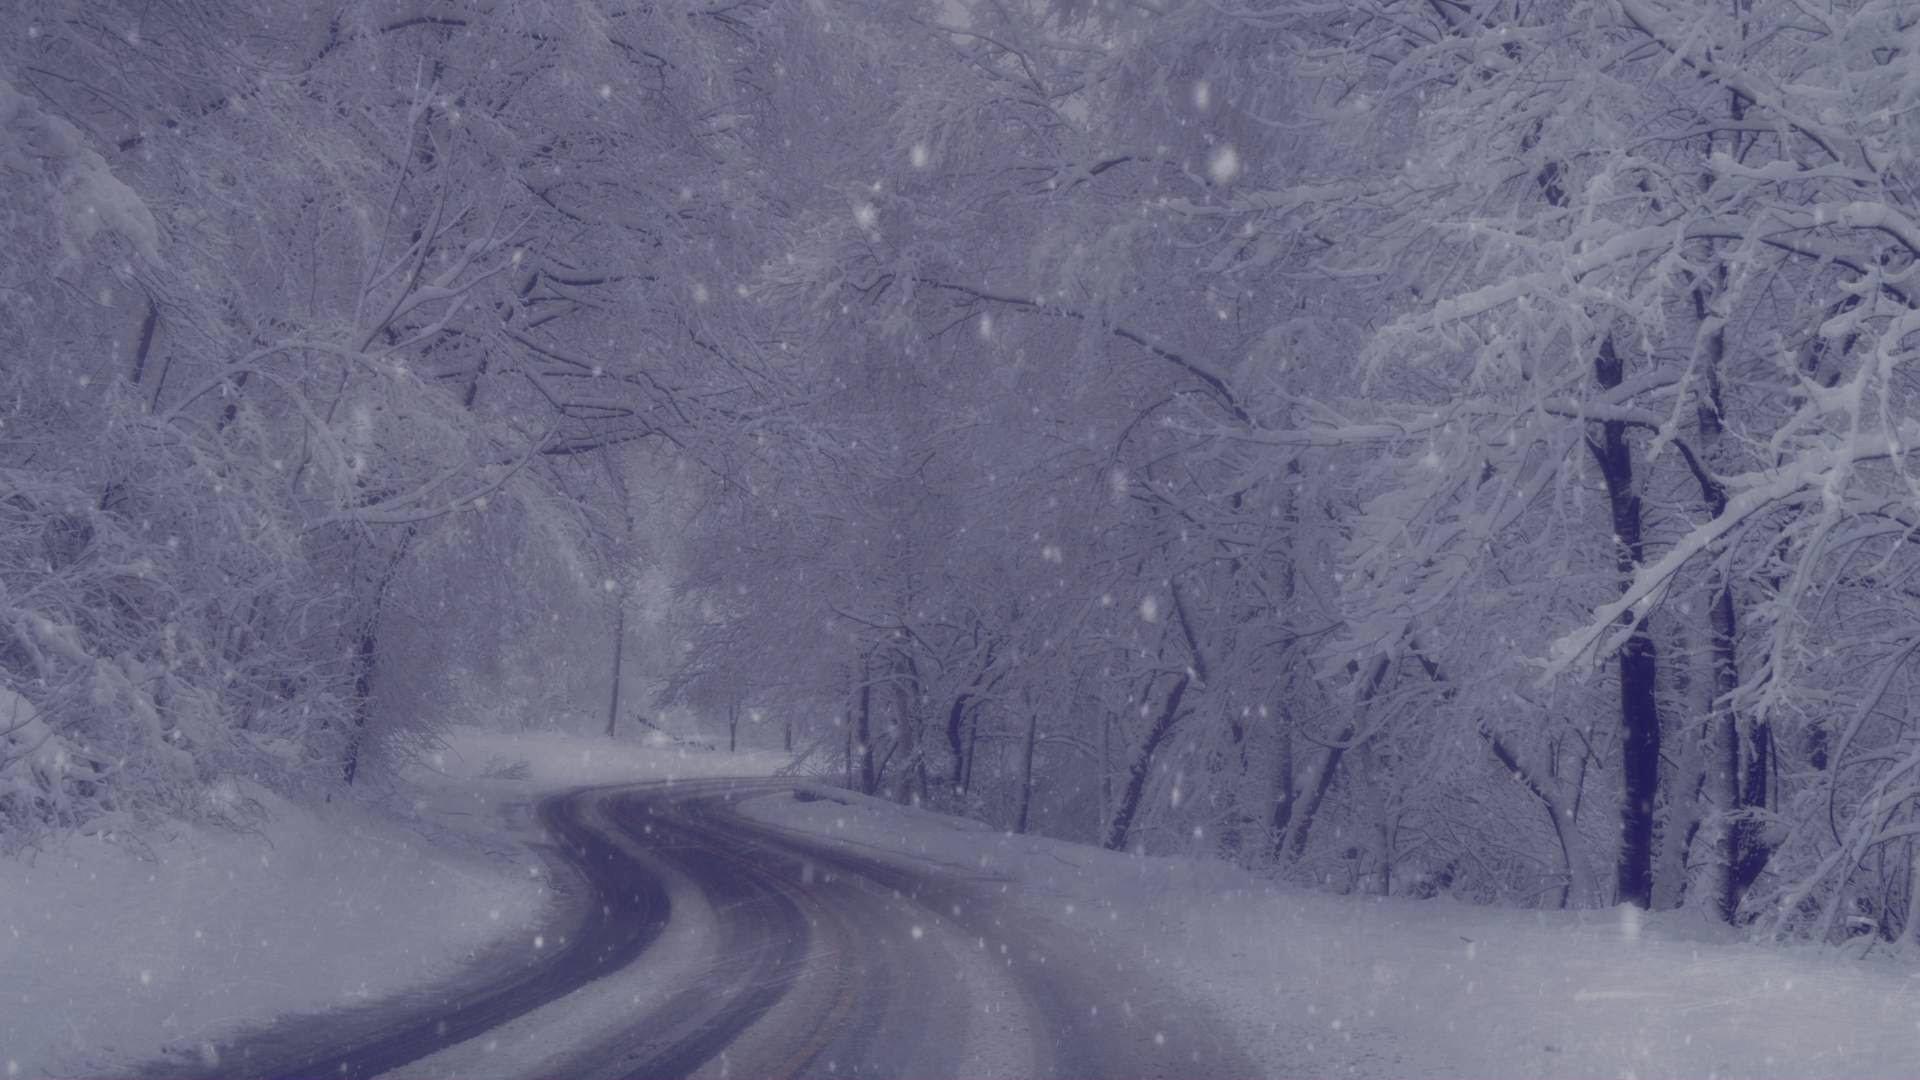 Free Christmas Falling Snow Wallpaper Winter Wonderland Background 44 Images